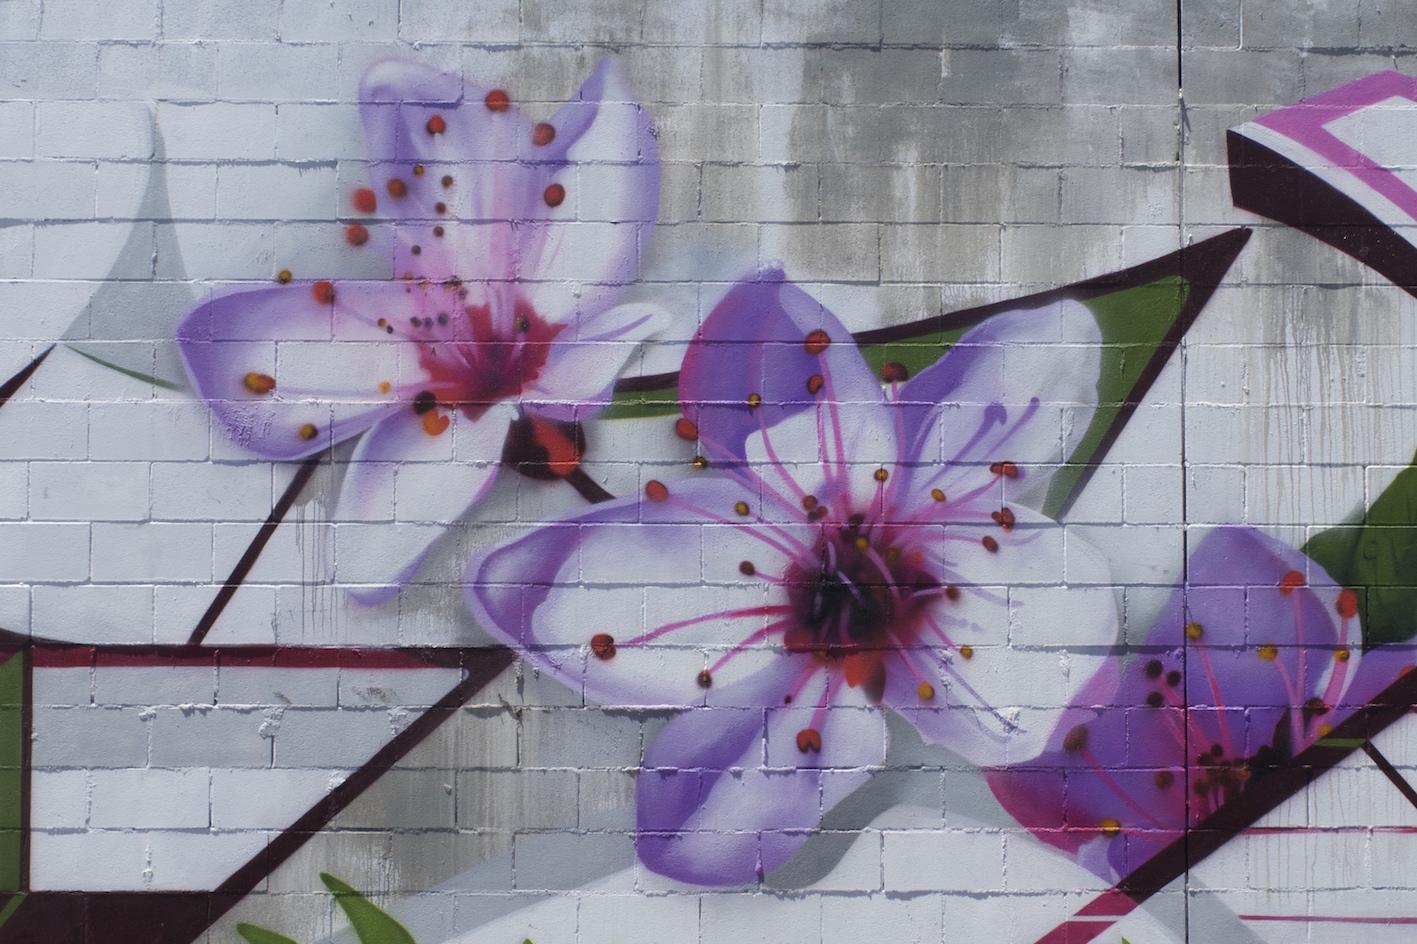 deansunshine_landofsunshine_melbourne_streetart_graffiti_ DVATE going large melb 4